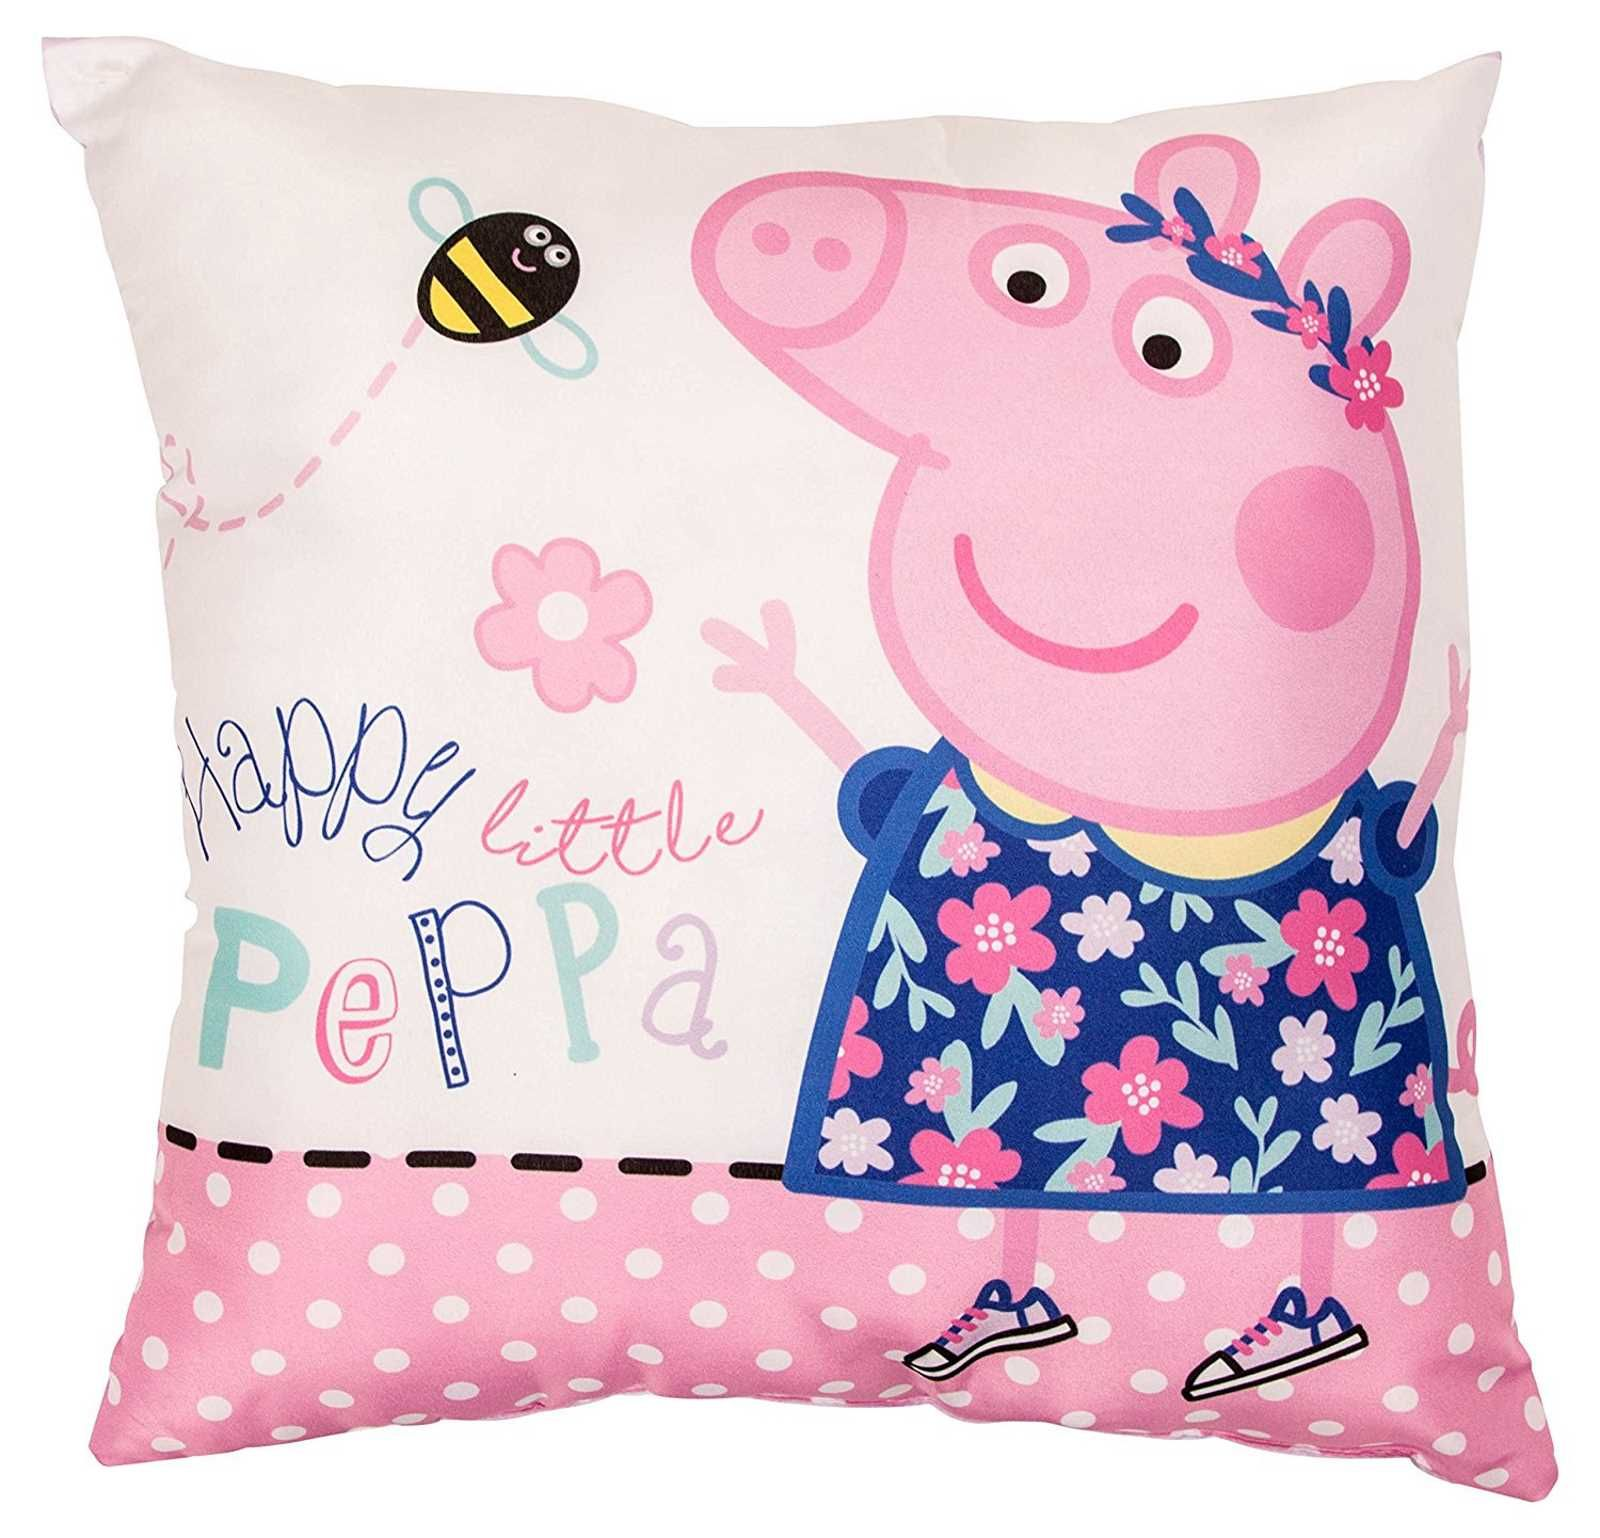 Peppa HAPPY Square Cushion 1 Bedroom accessories, Peppa